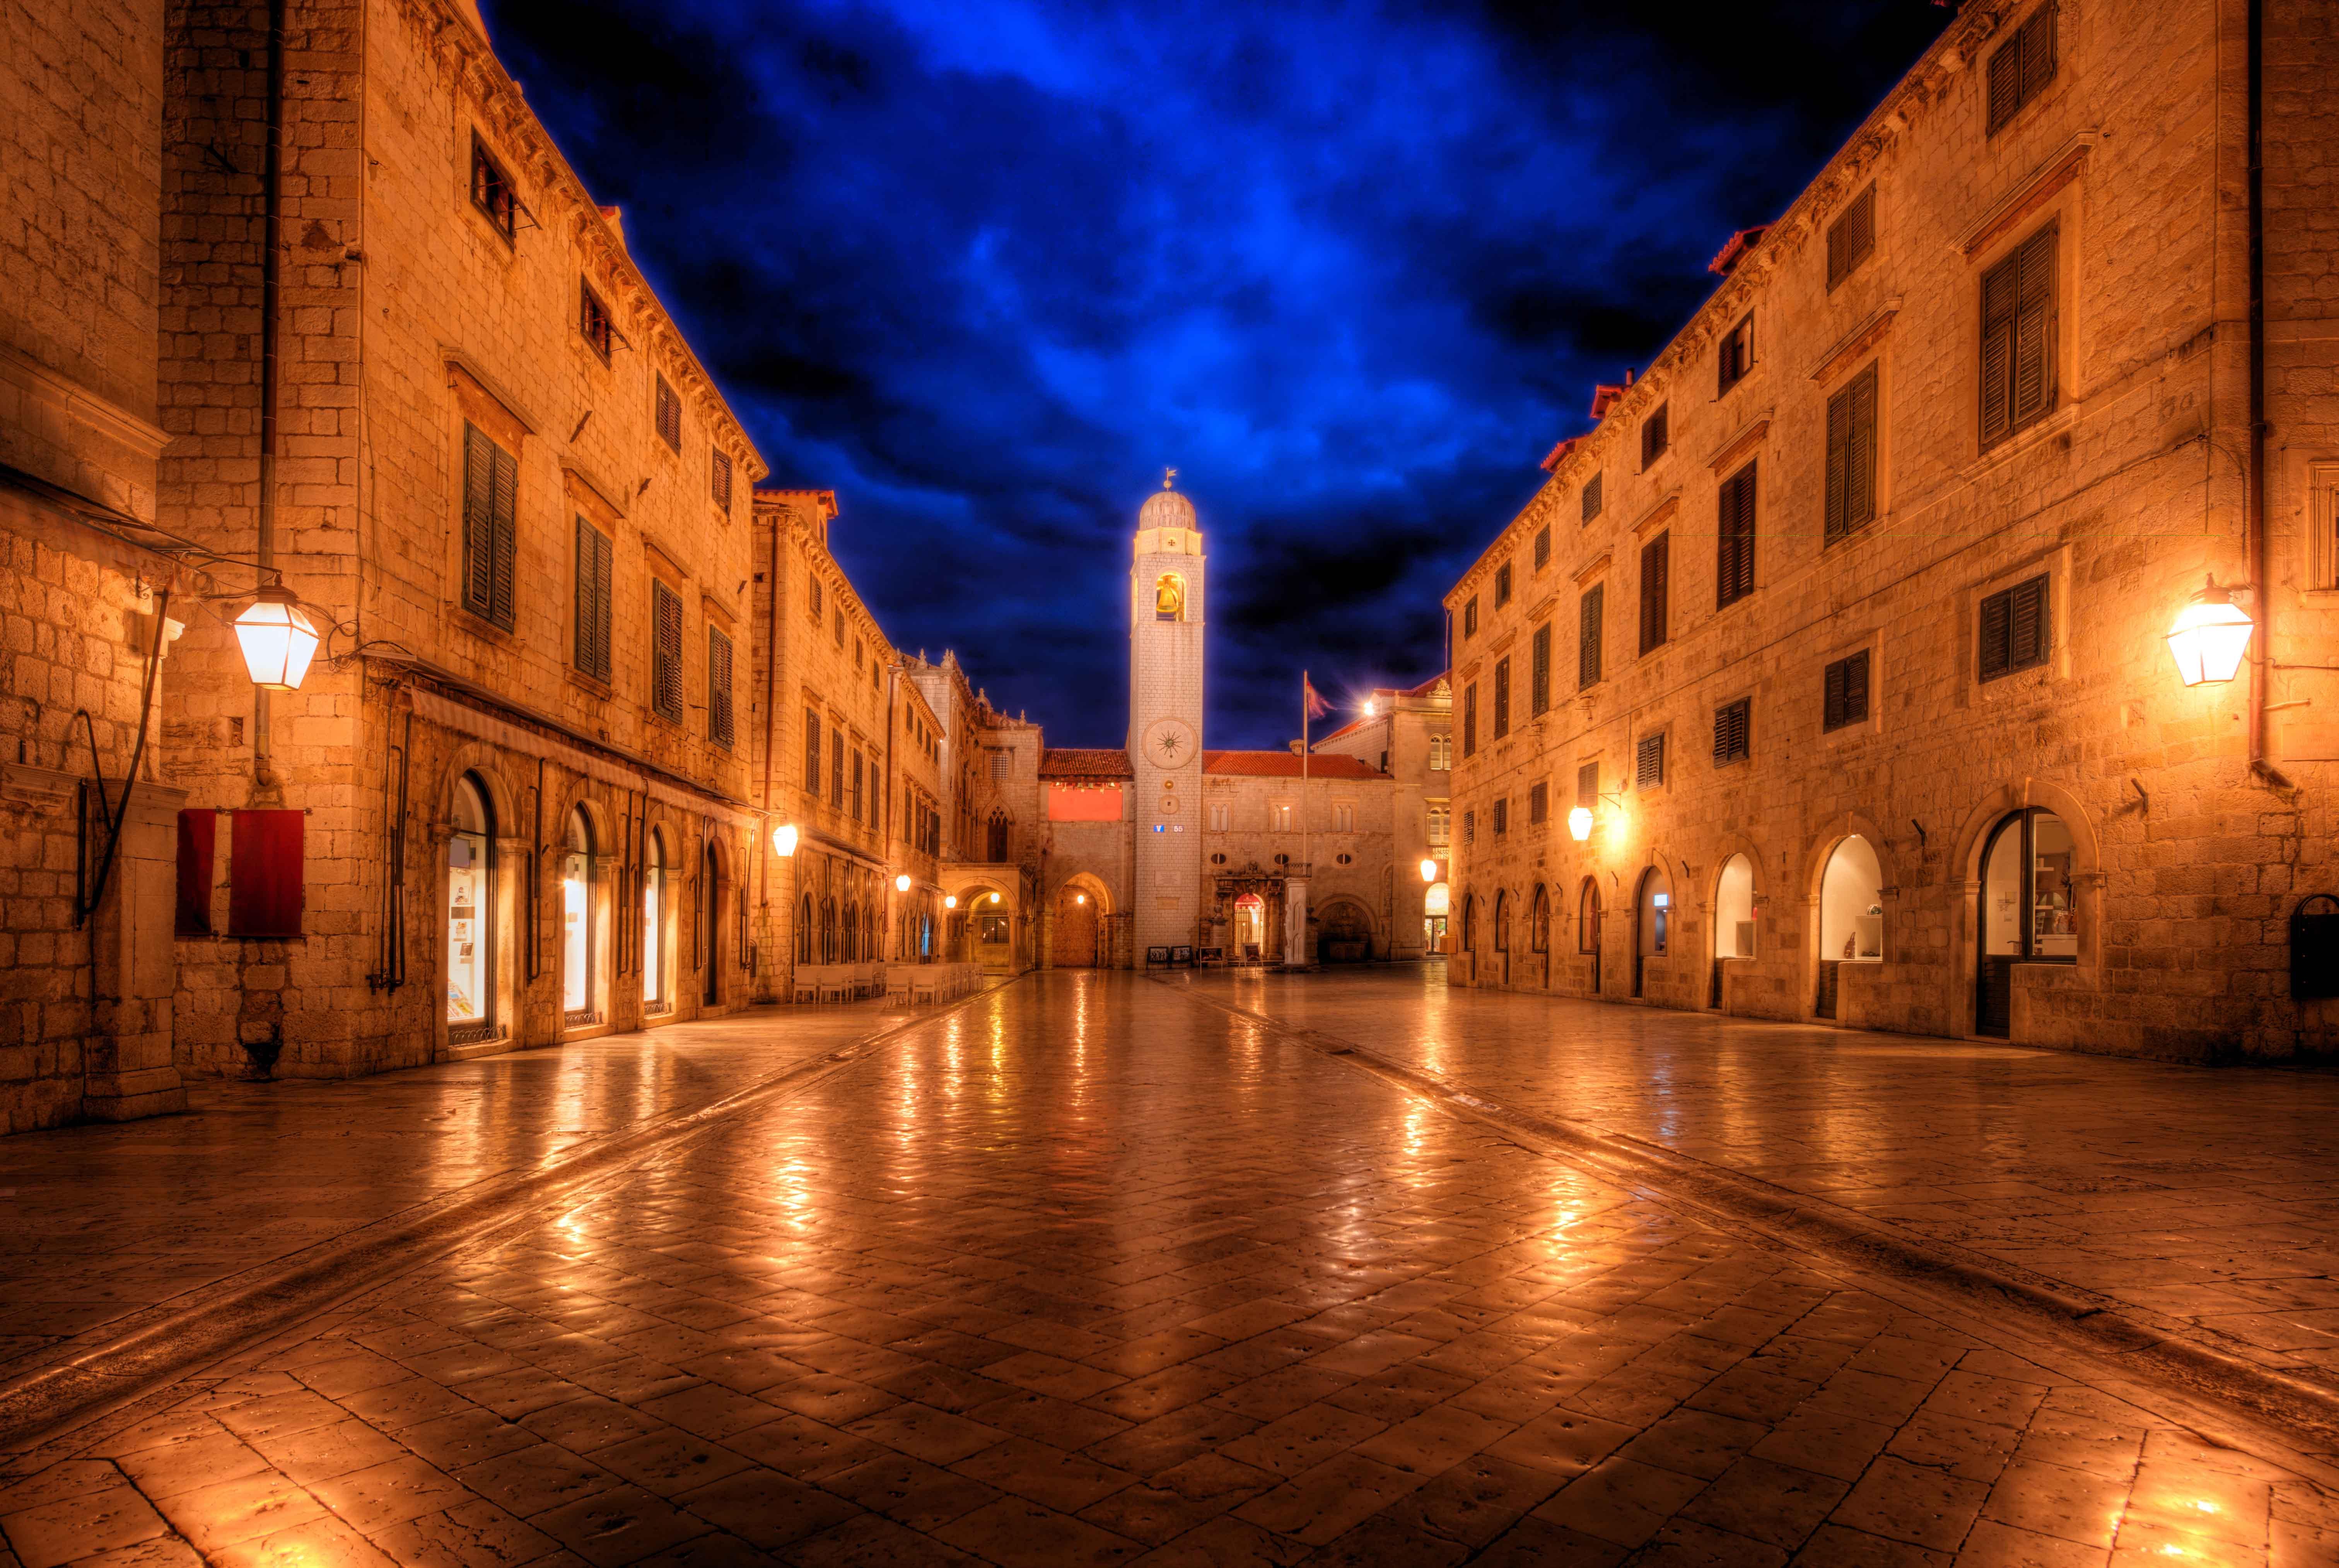 Stradun in the walled city of Dubrovnik, Croatia.